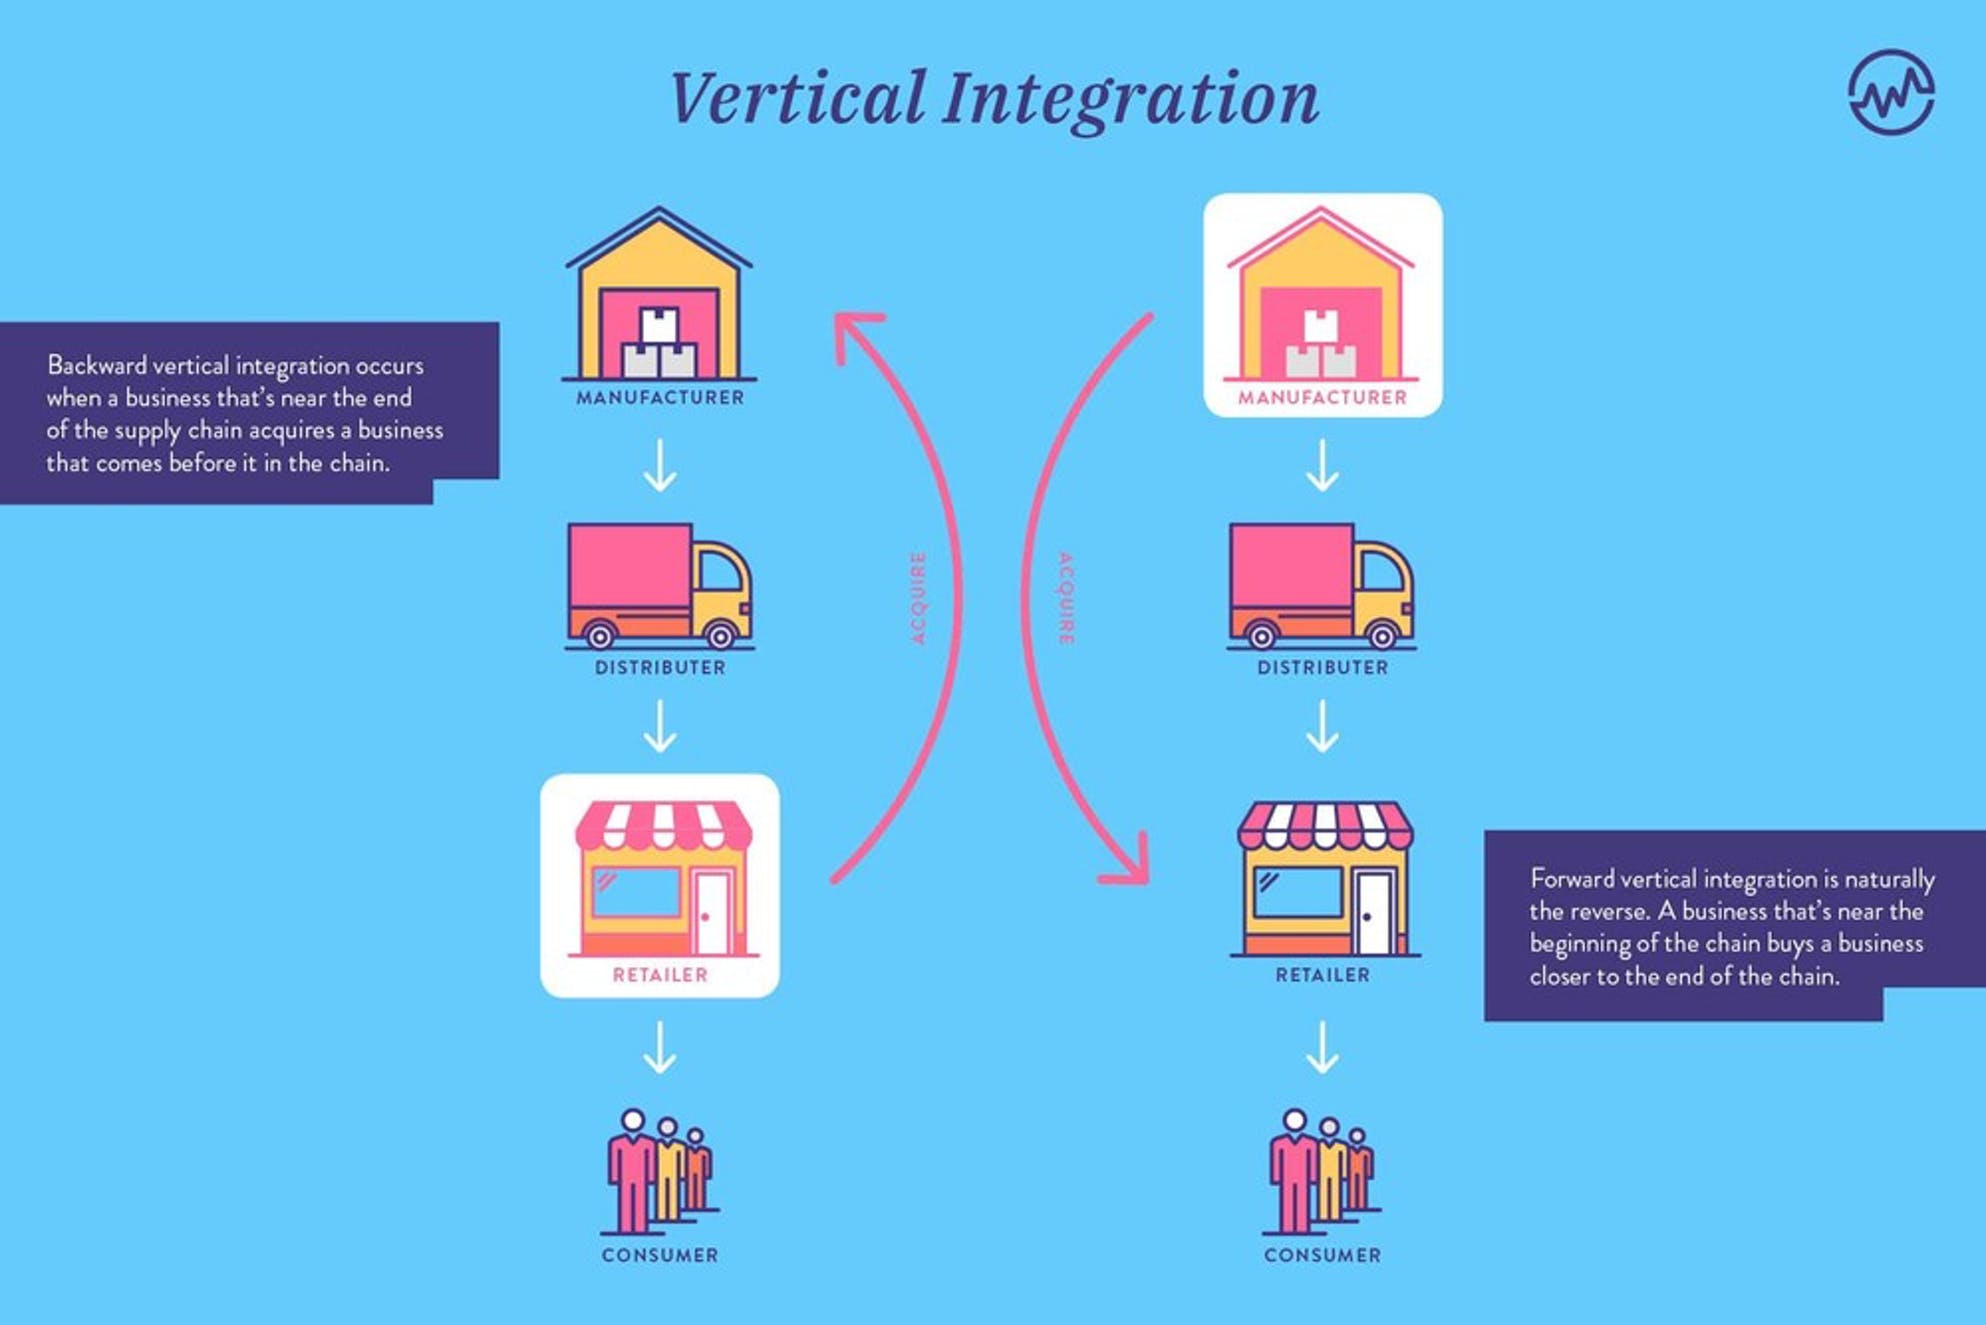 Vertical Integration graphic detailing forward and backward integration